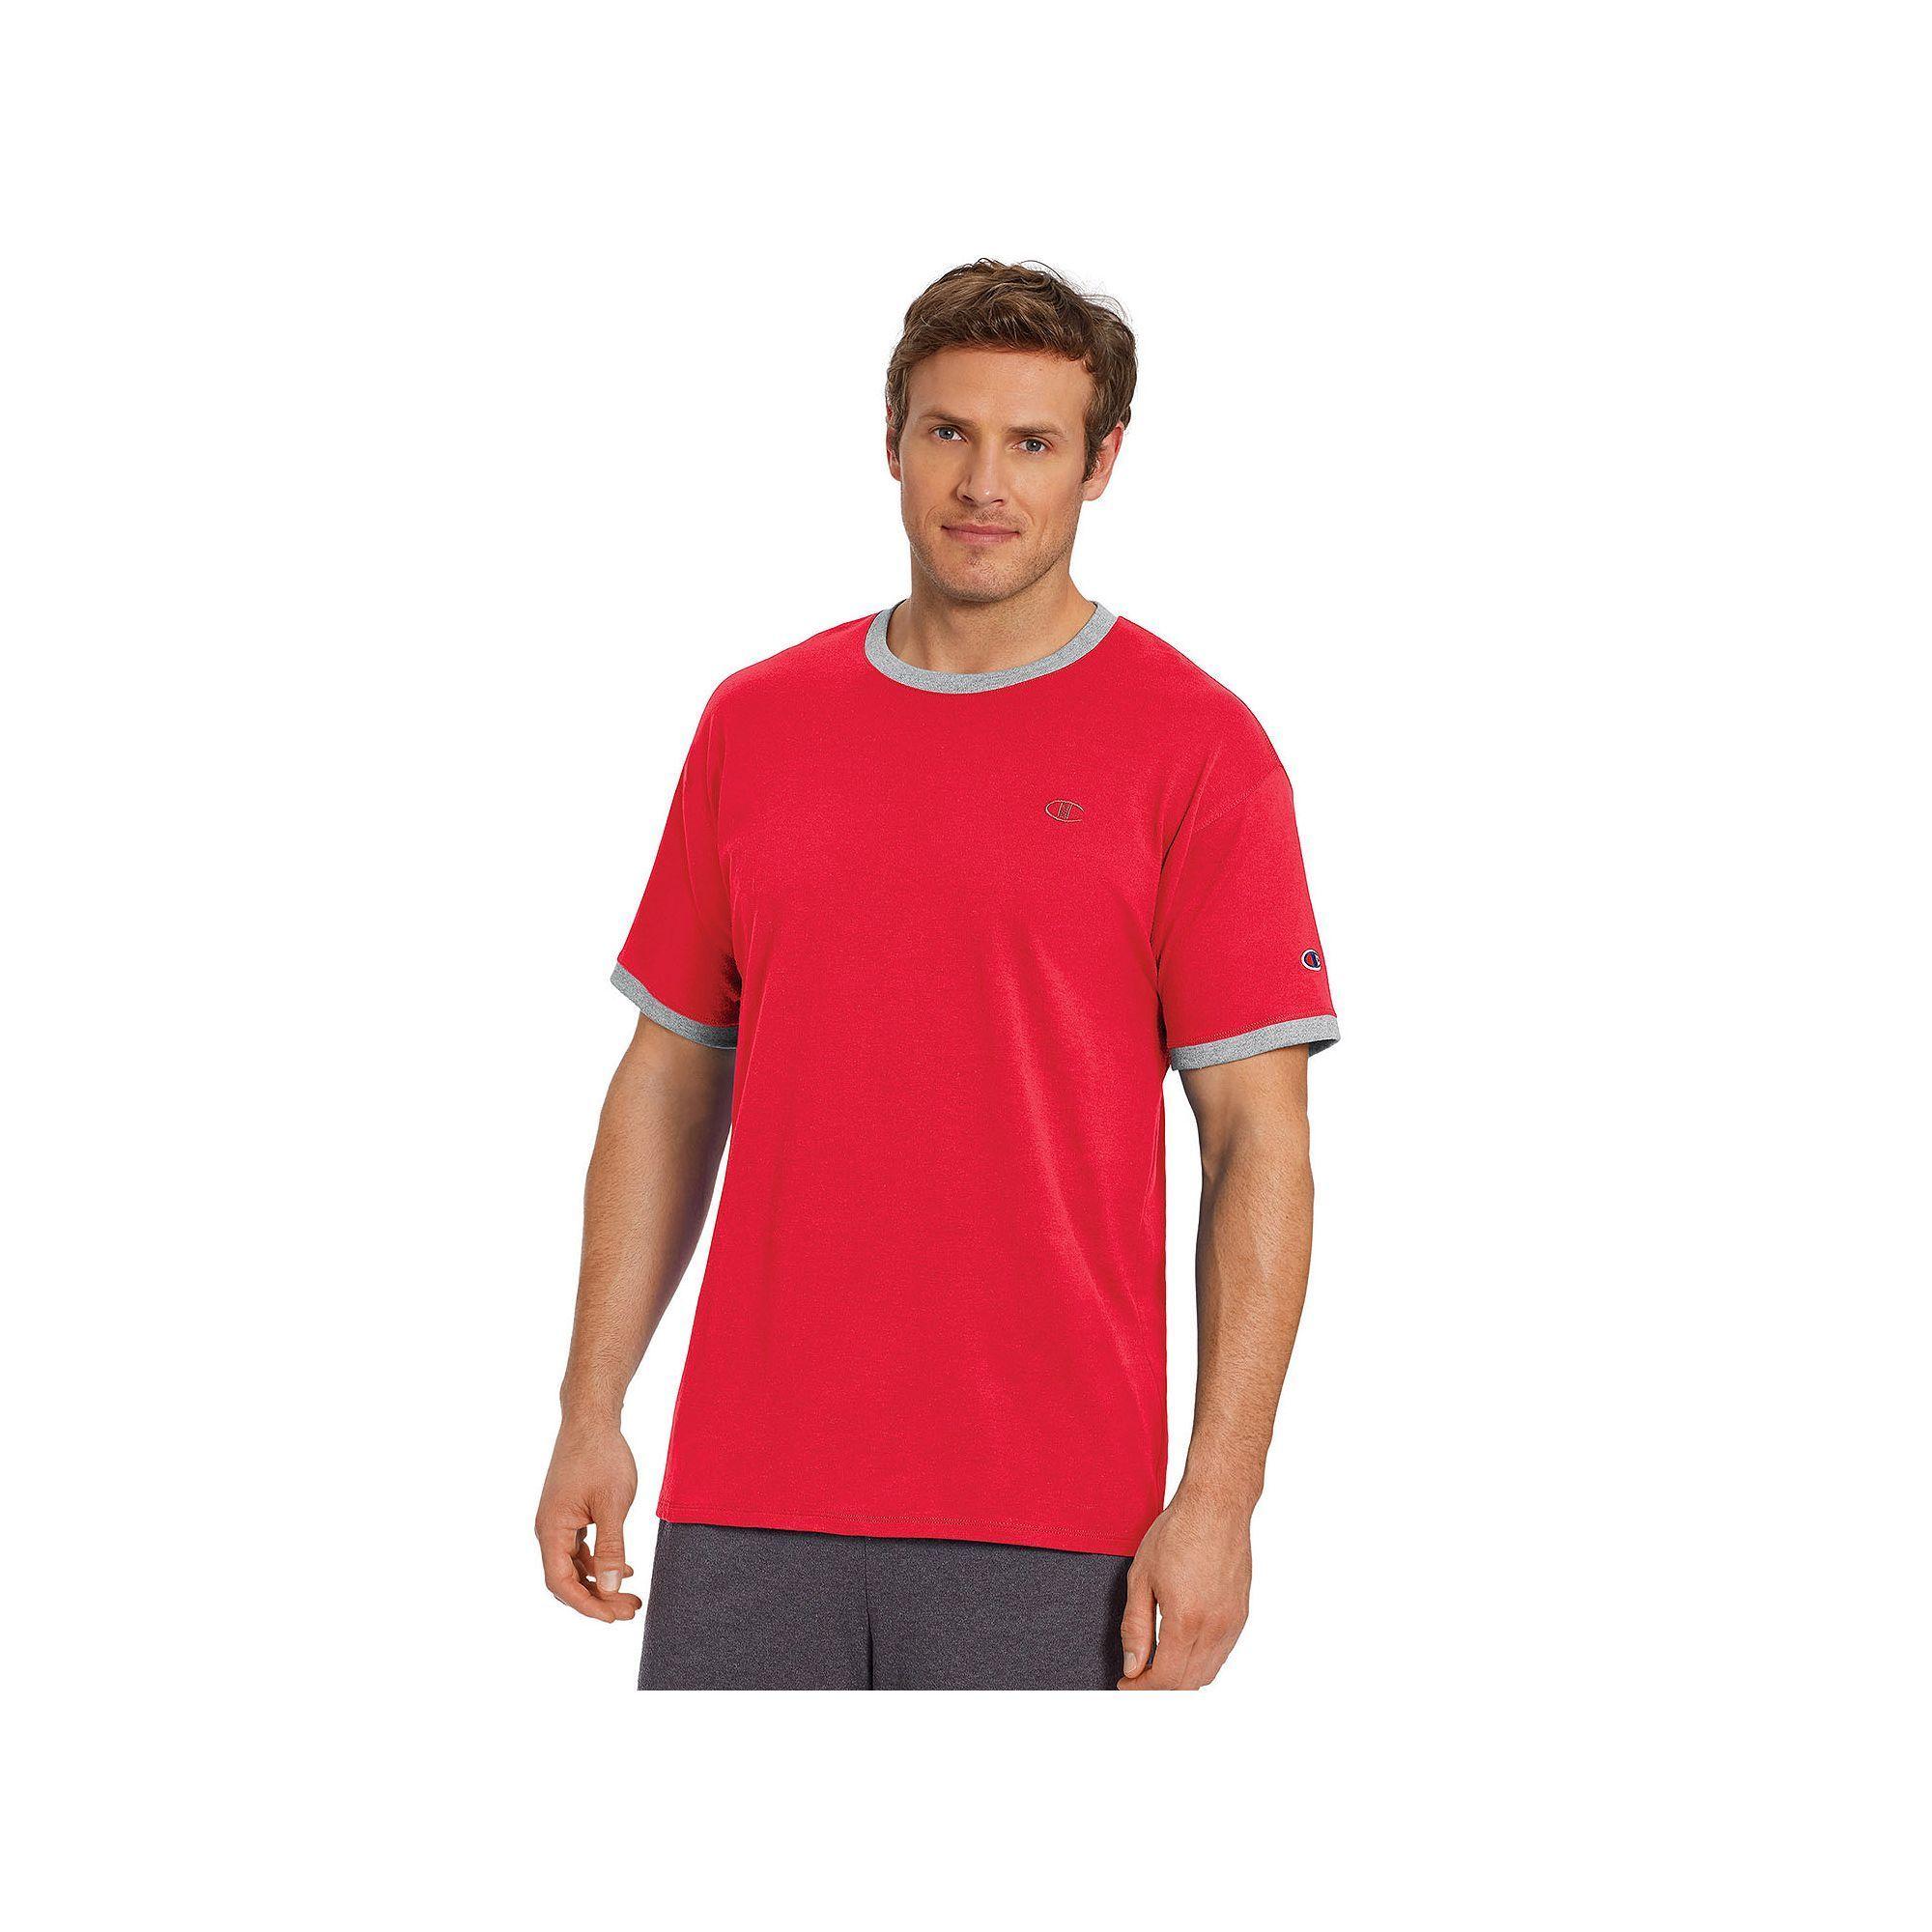 b375a3f0 Mens Champion T Shirt Red